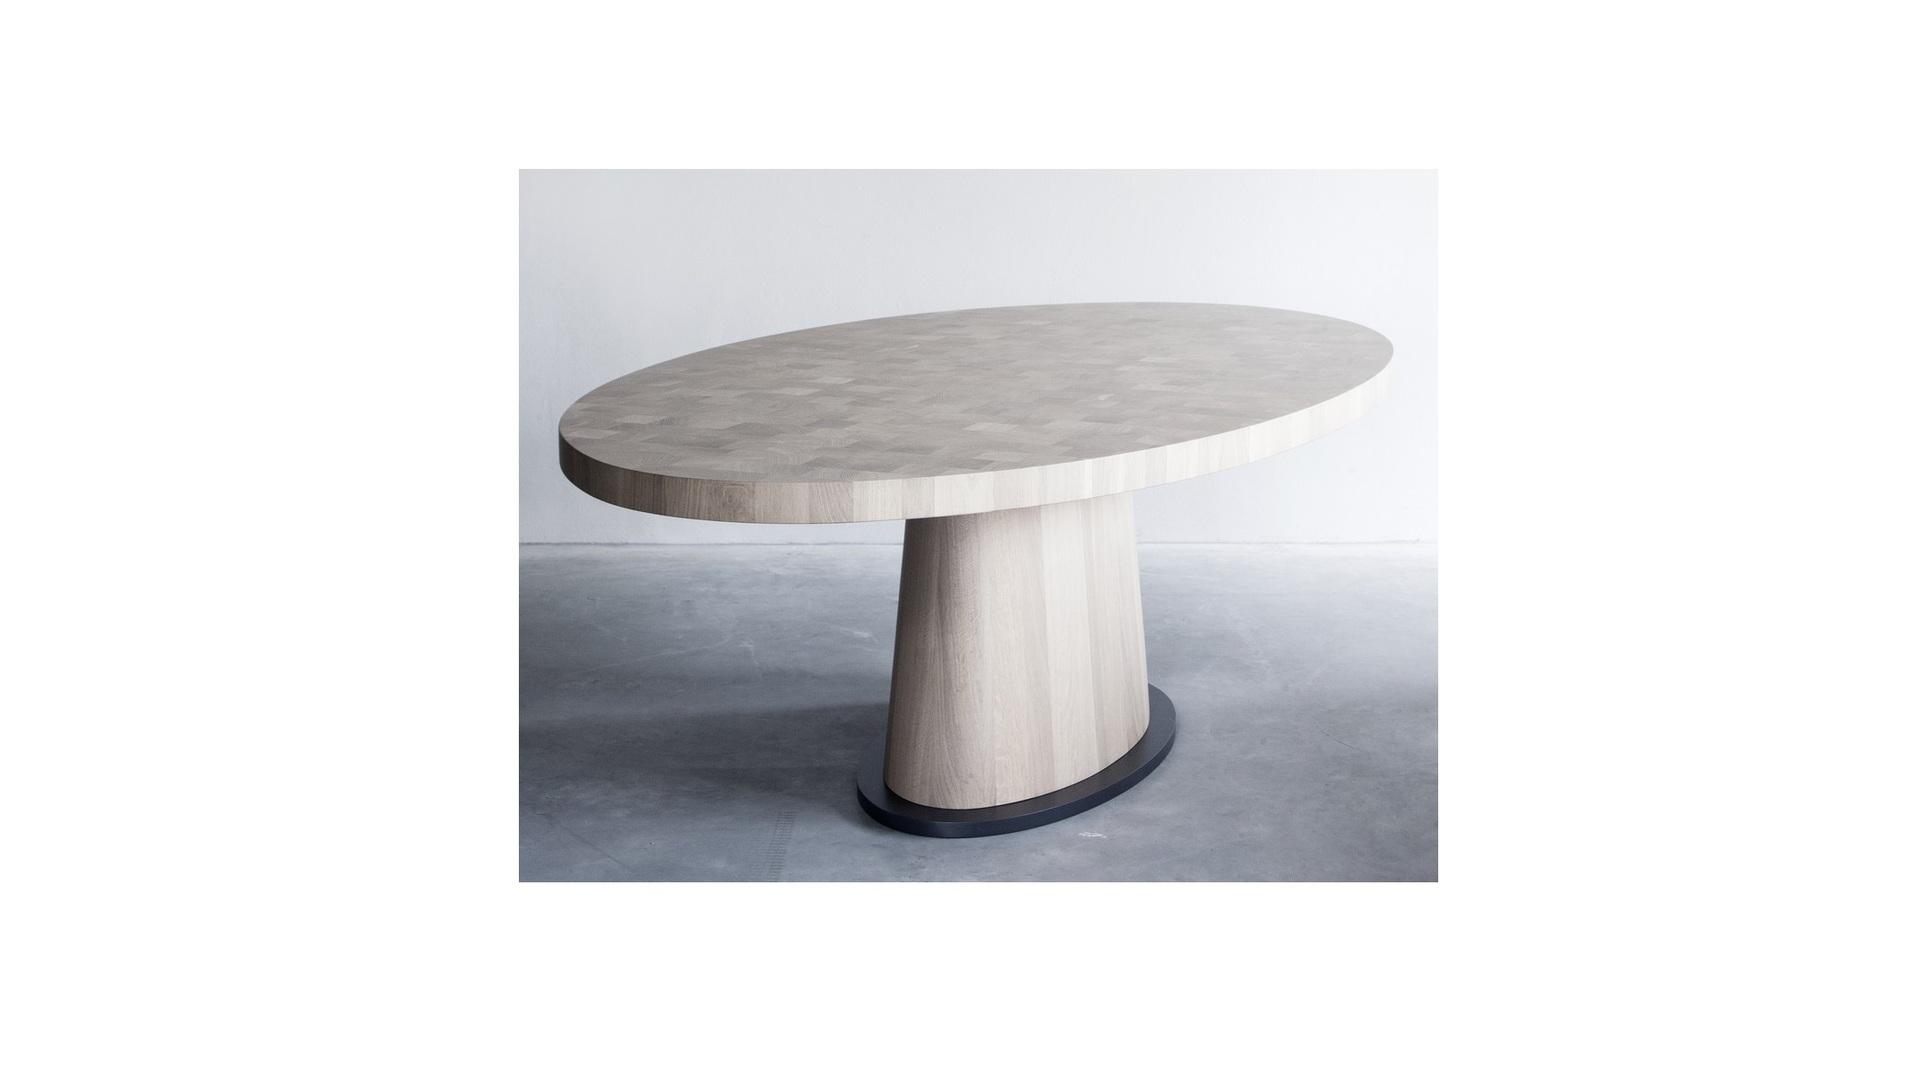 Kops oval table (3) klein.jpg